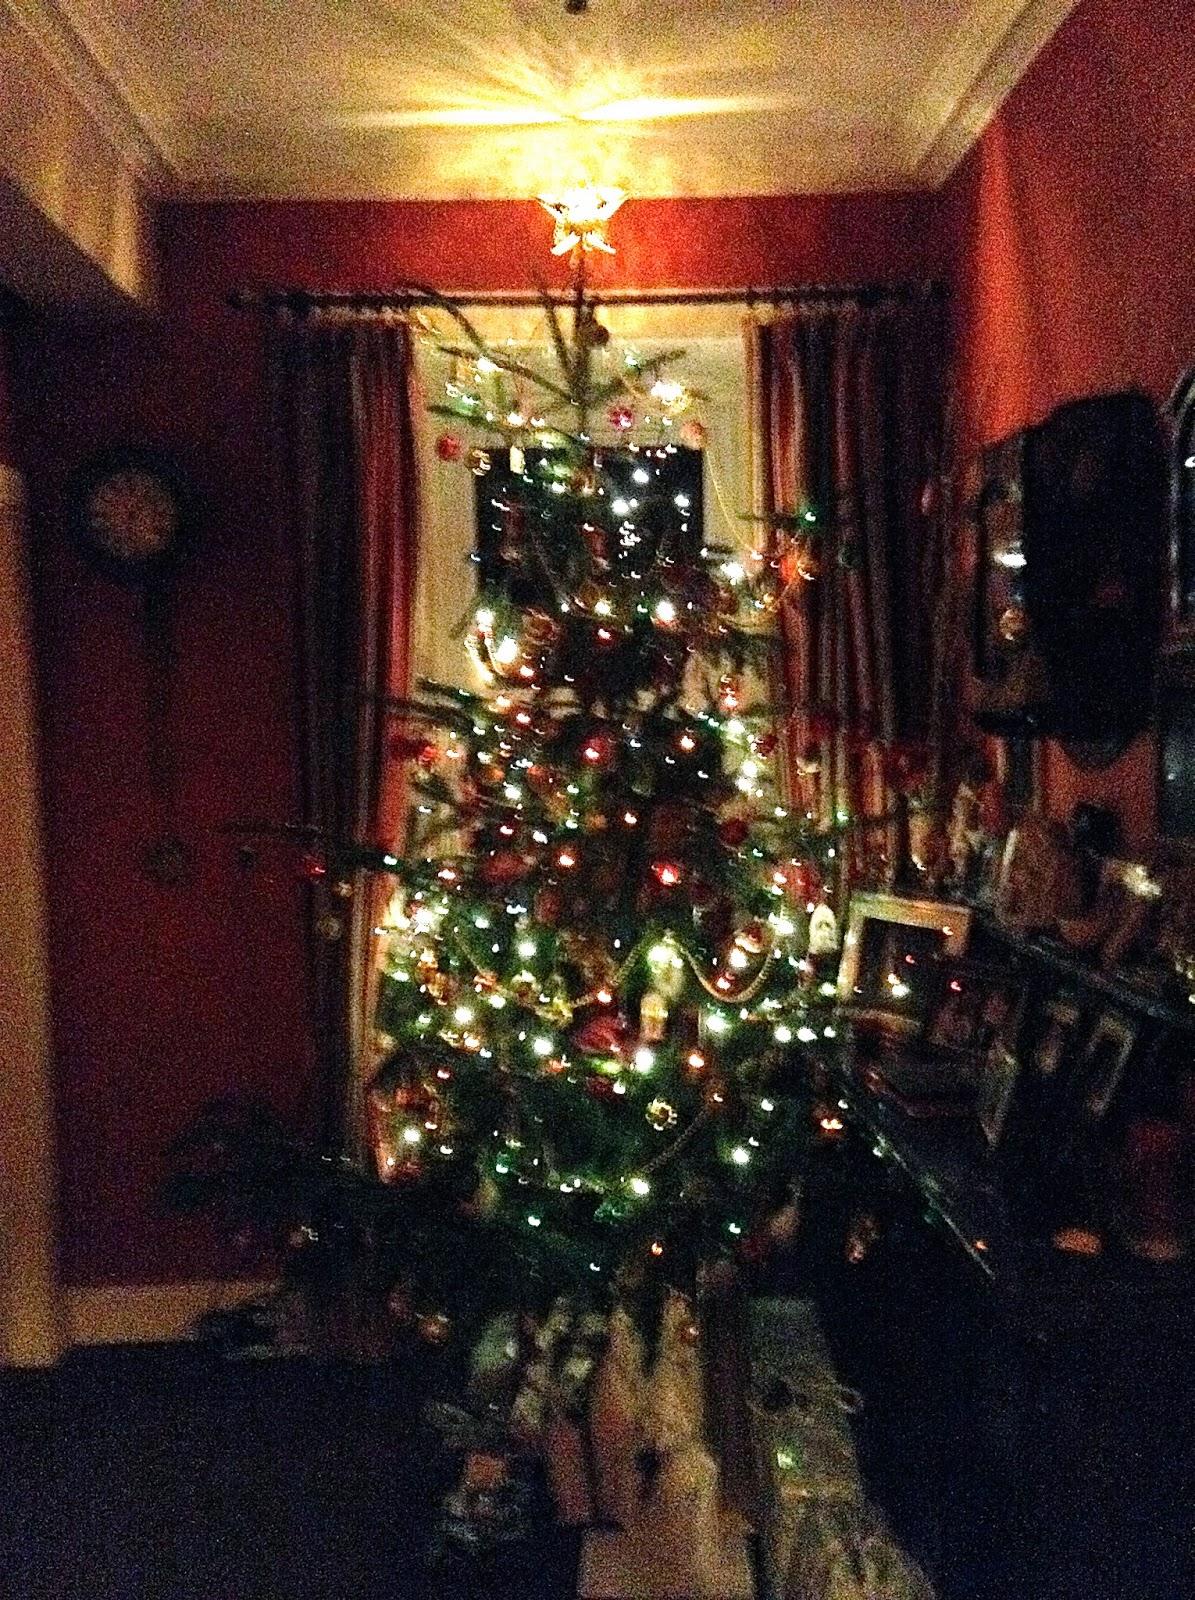 Christmas tree with lights, star & presents